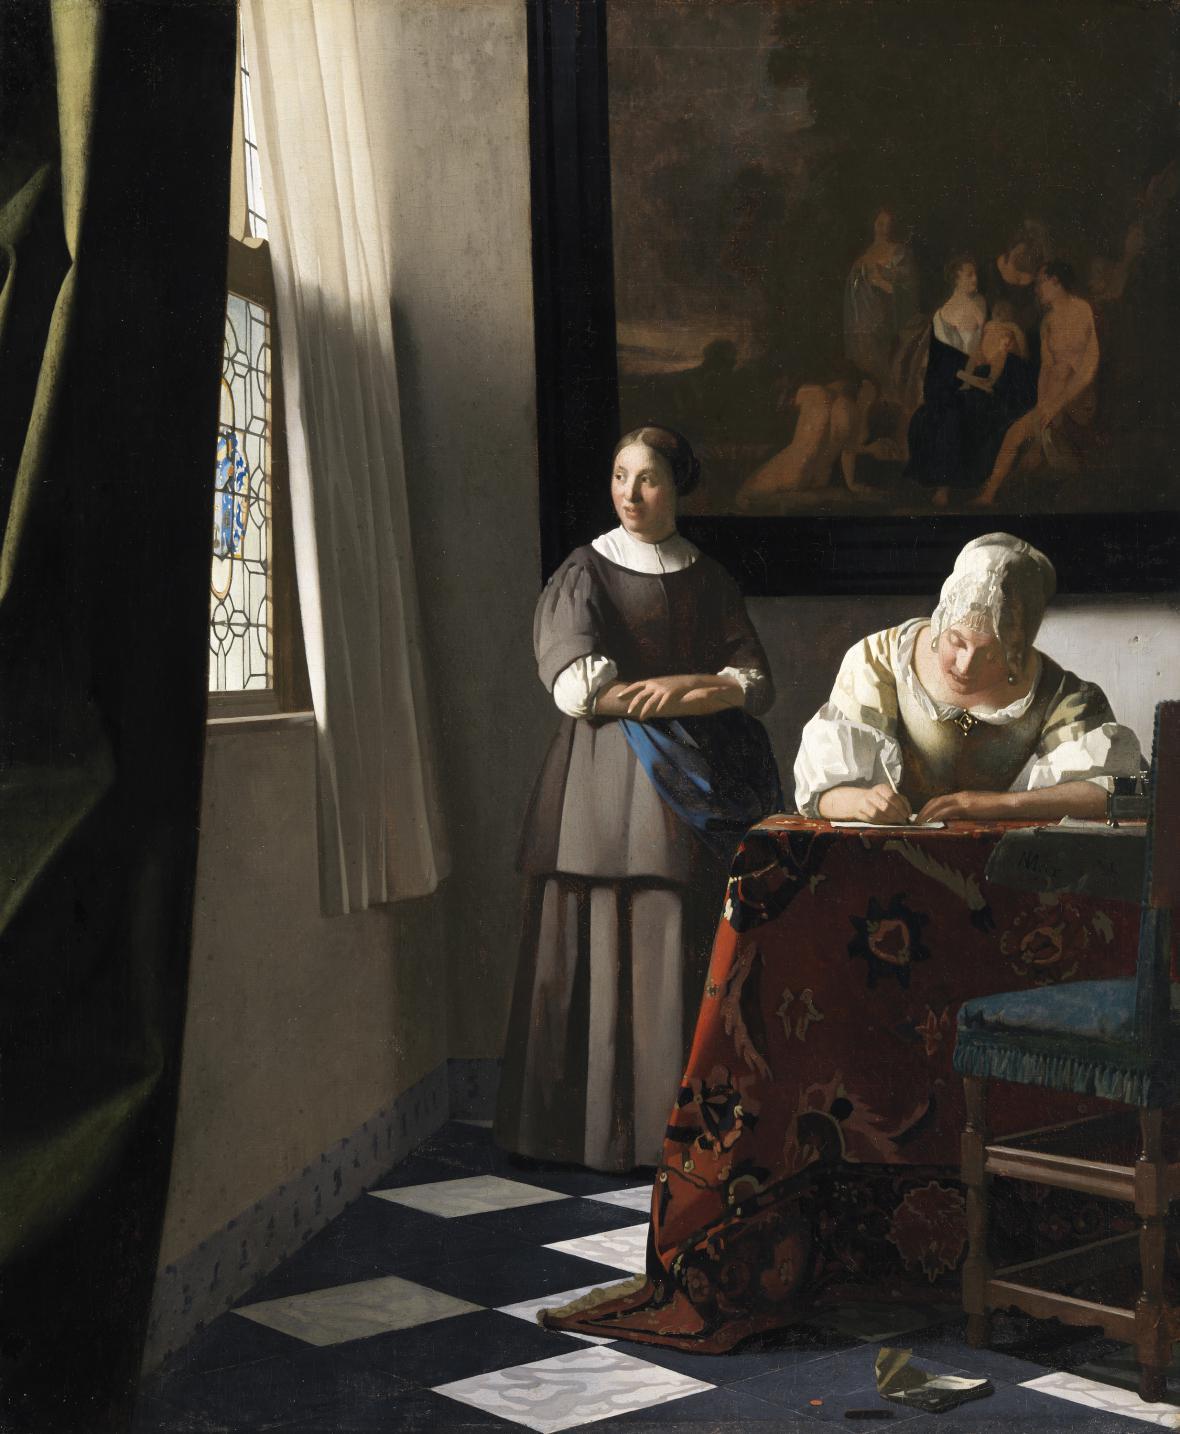 Johannes Vermeer / Žena píšící dopis, okolo 1670